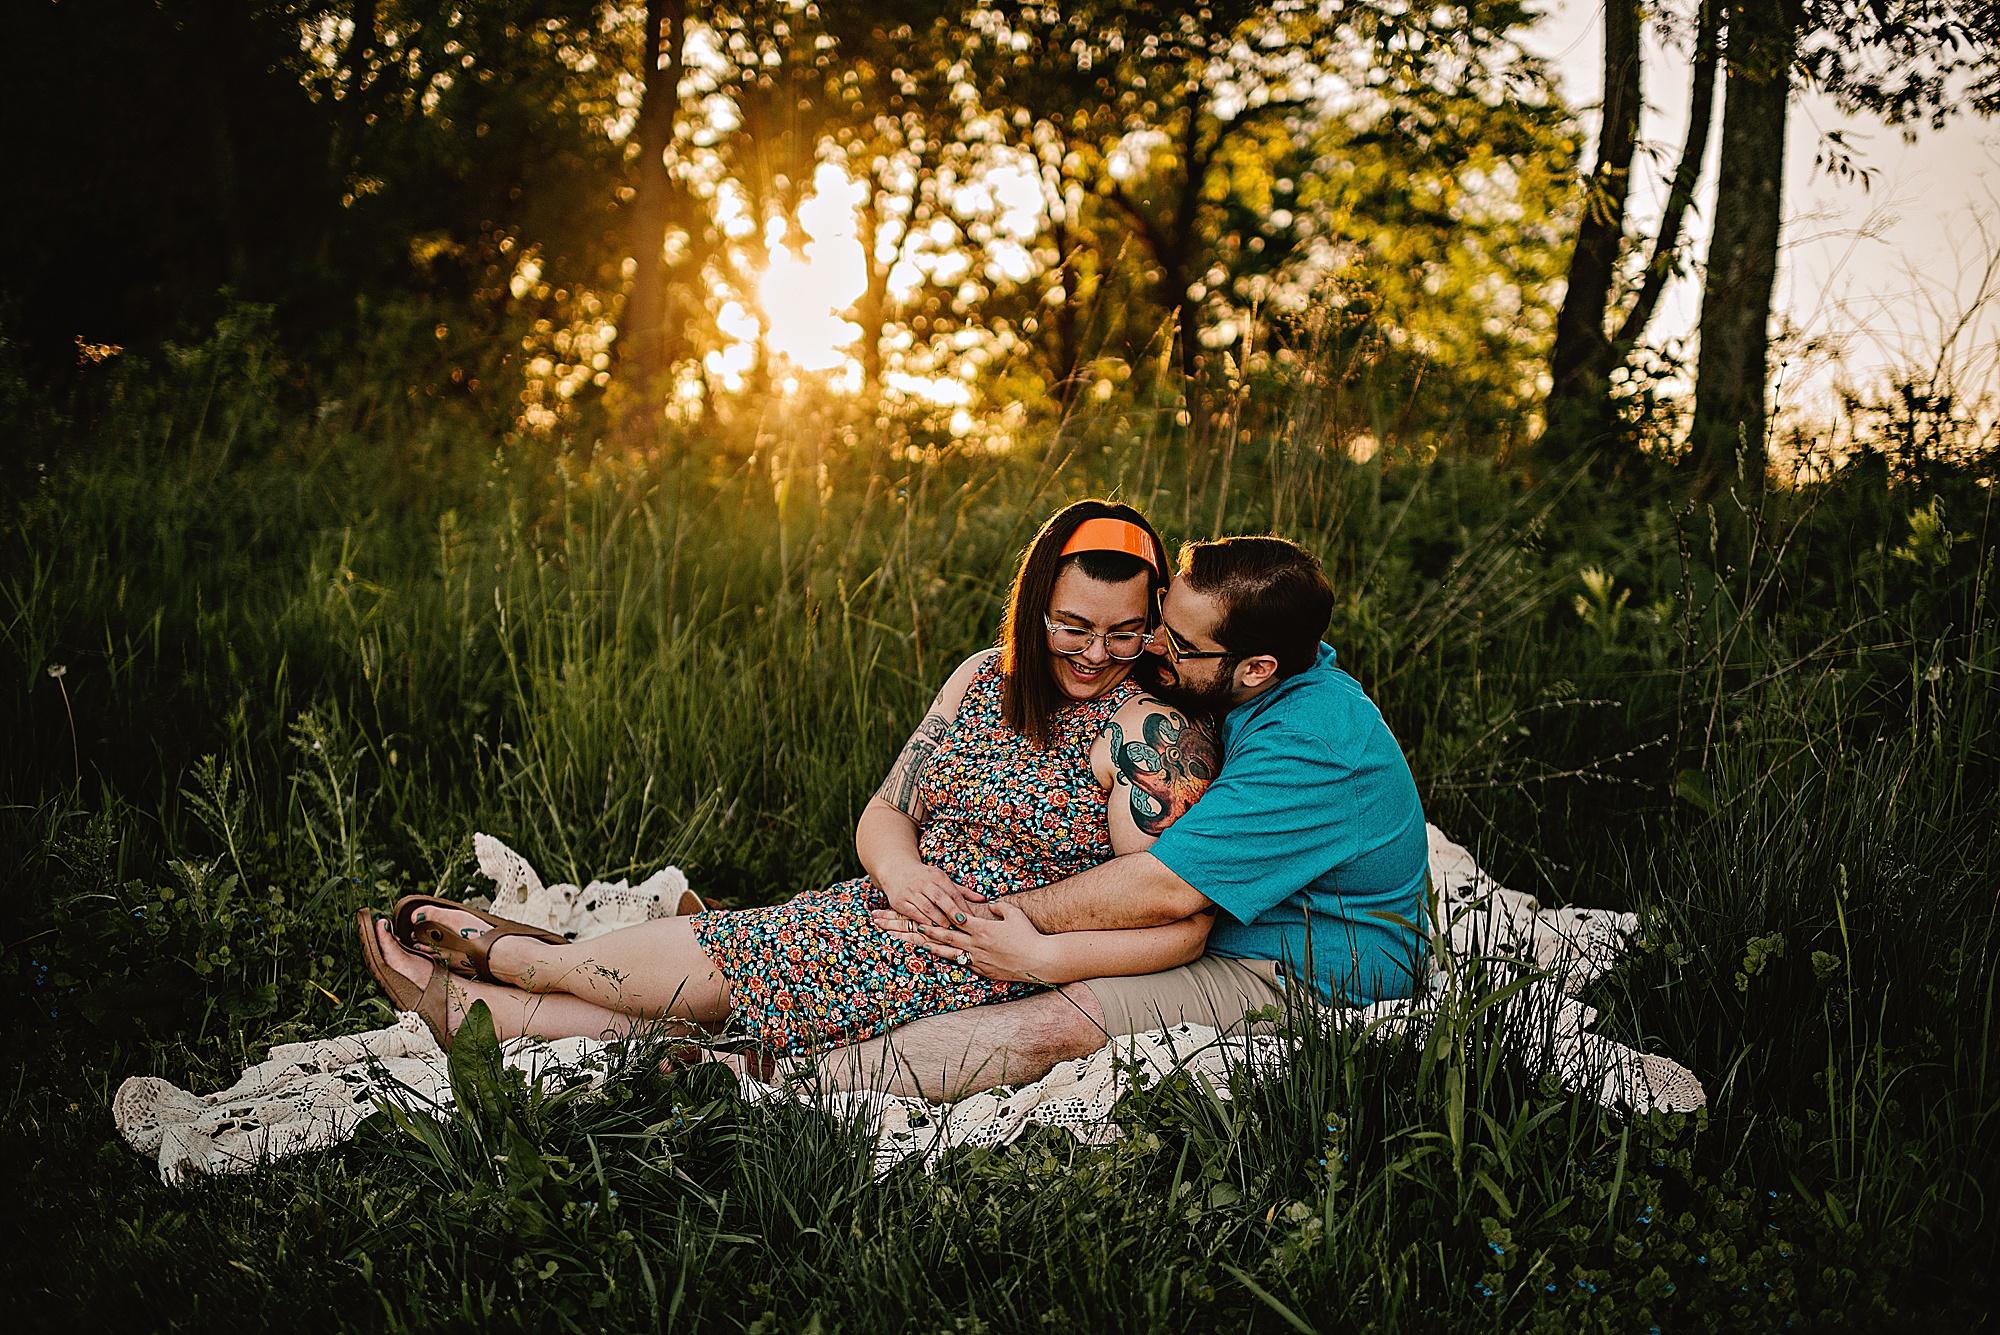 lauren-grayson-photography-akron-ohio-best-family-photos-2018-cleveland_0003.jpg